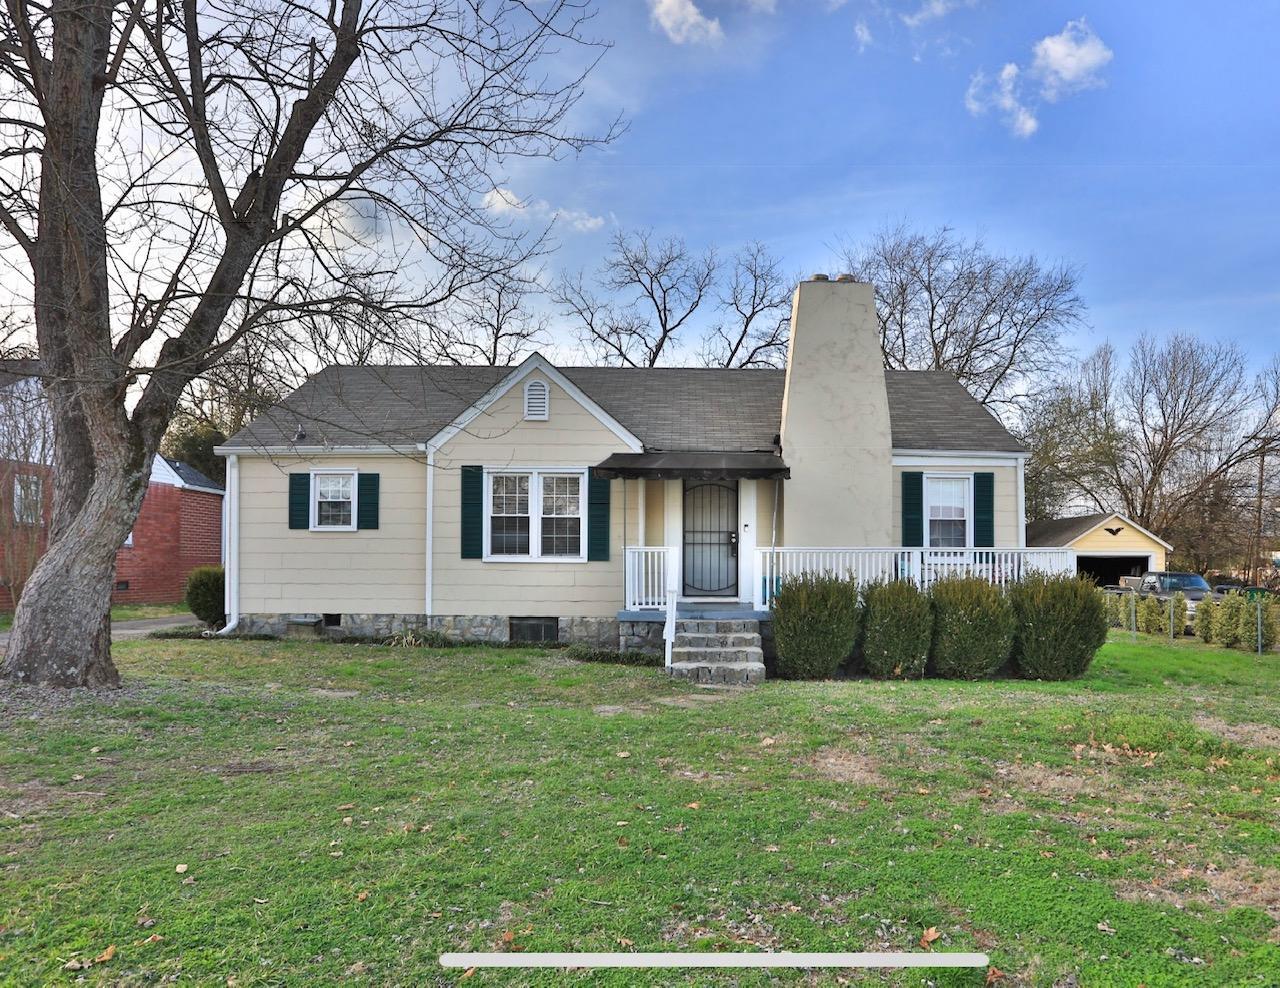 503 Sharondale Rd, Chattanooga, TN 37412